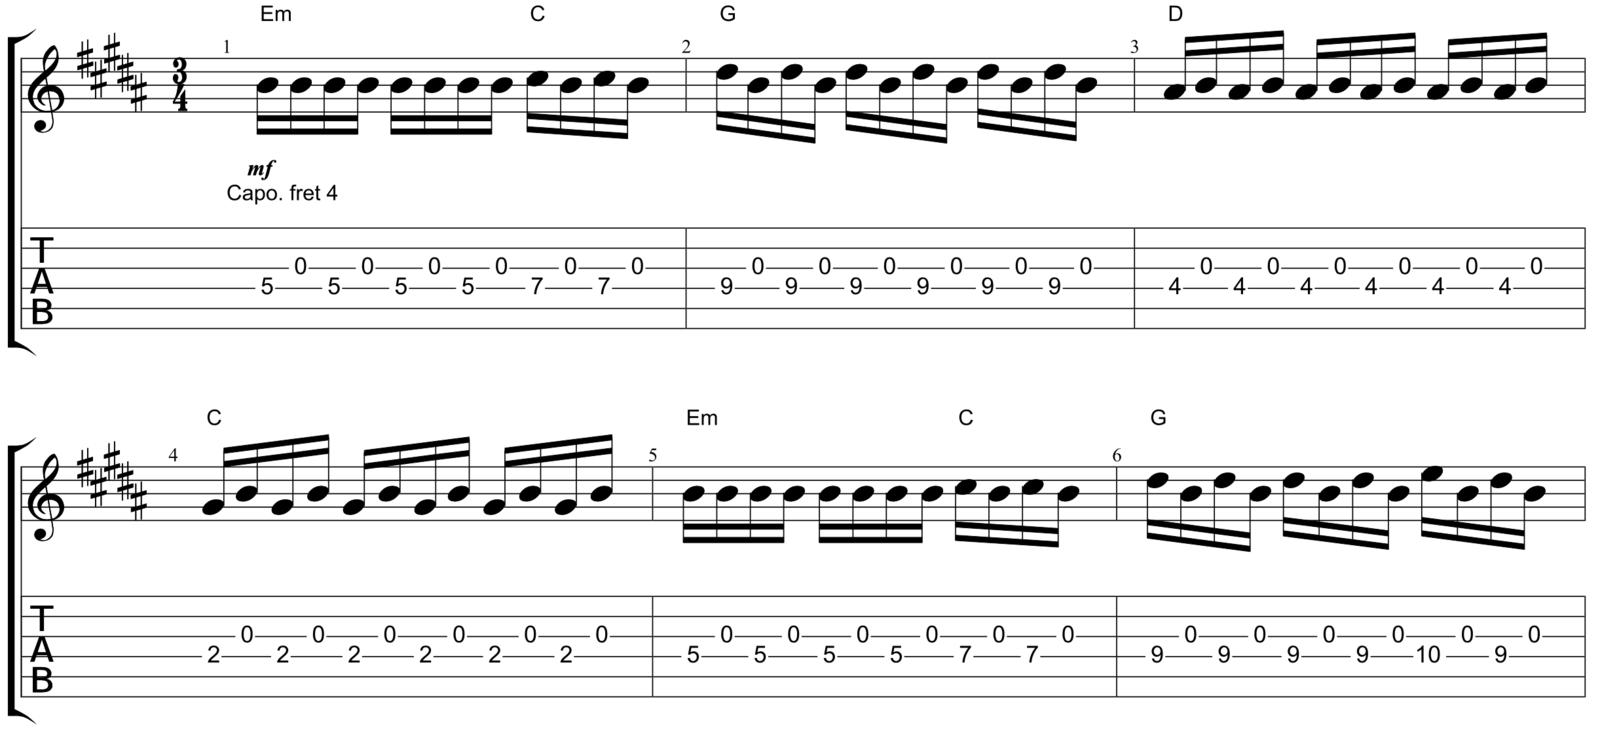 Acoustic Verse 2